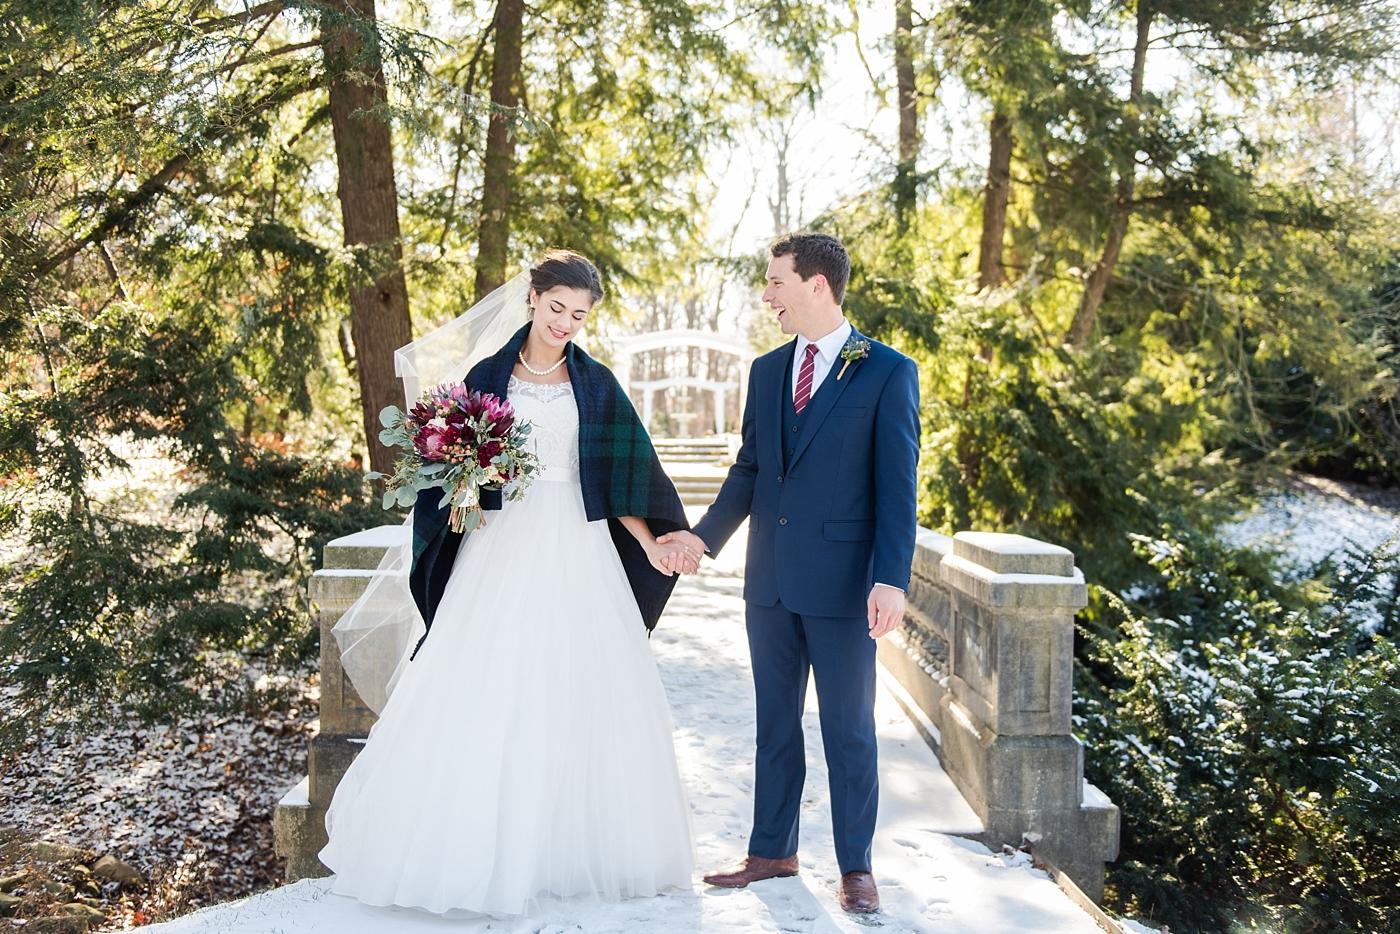 indianapolis-top-rated-wedding-photographers_0438.jpg